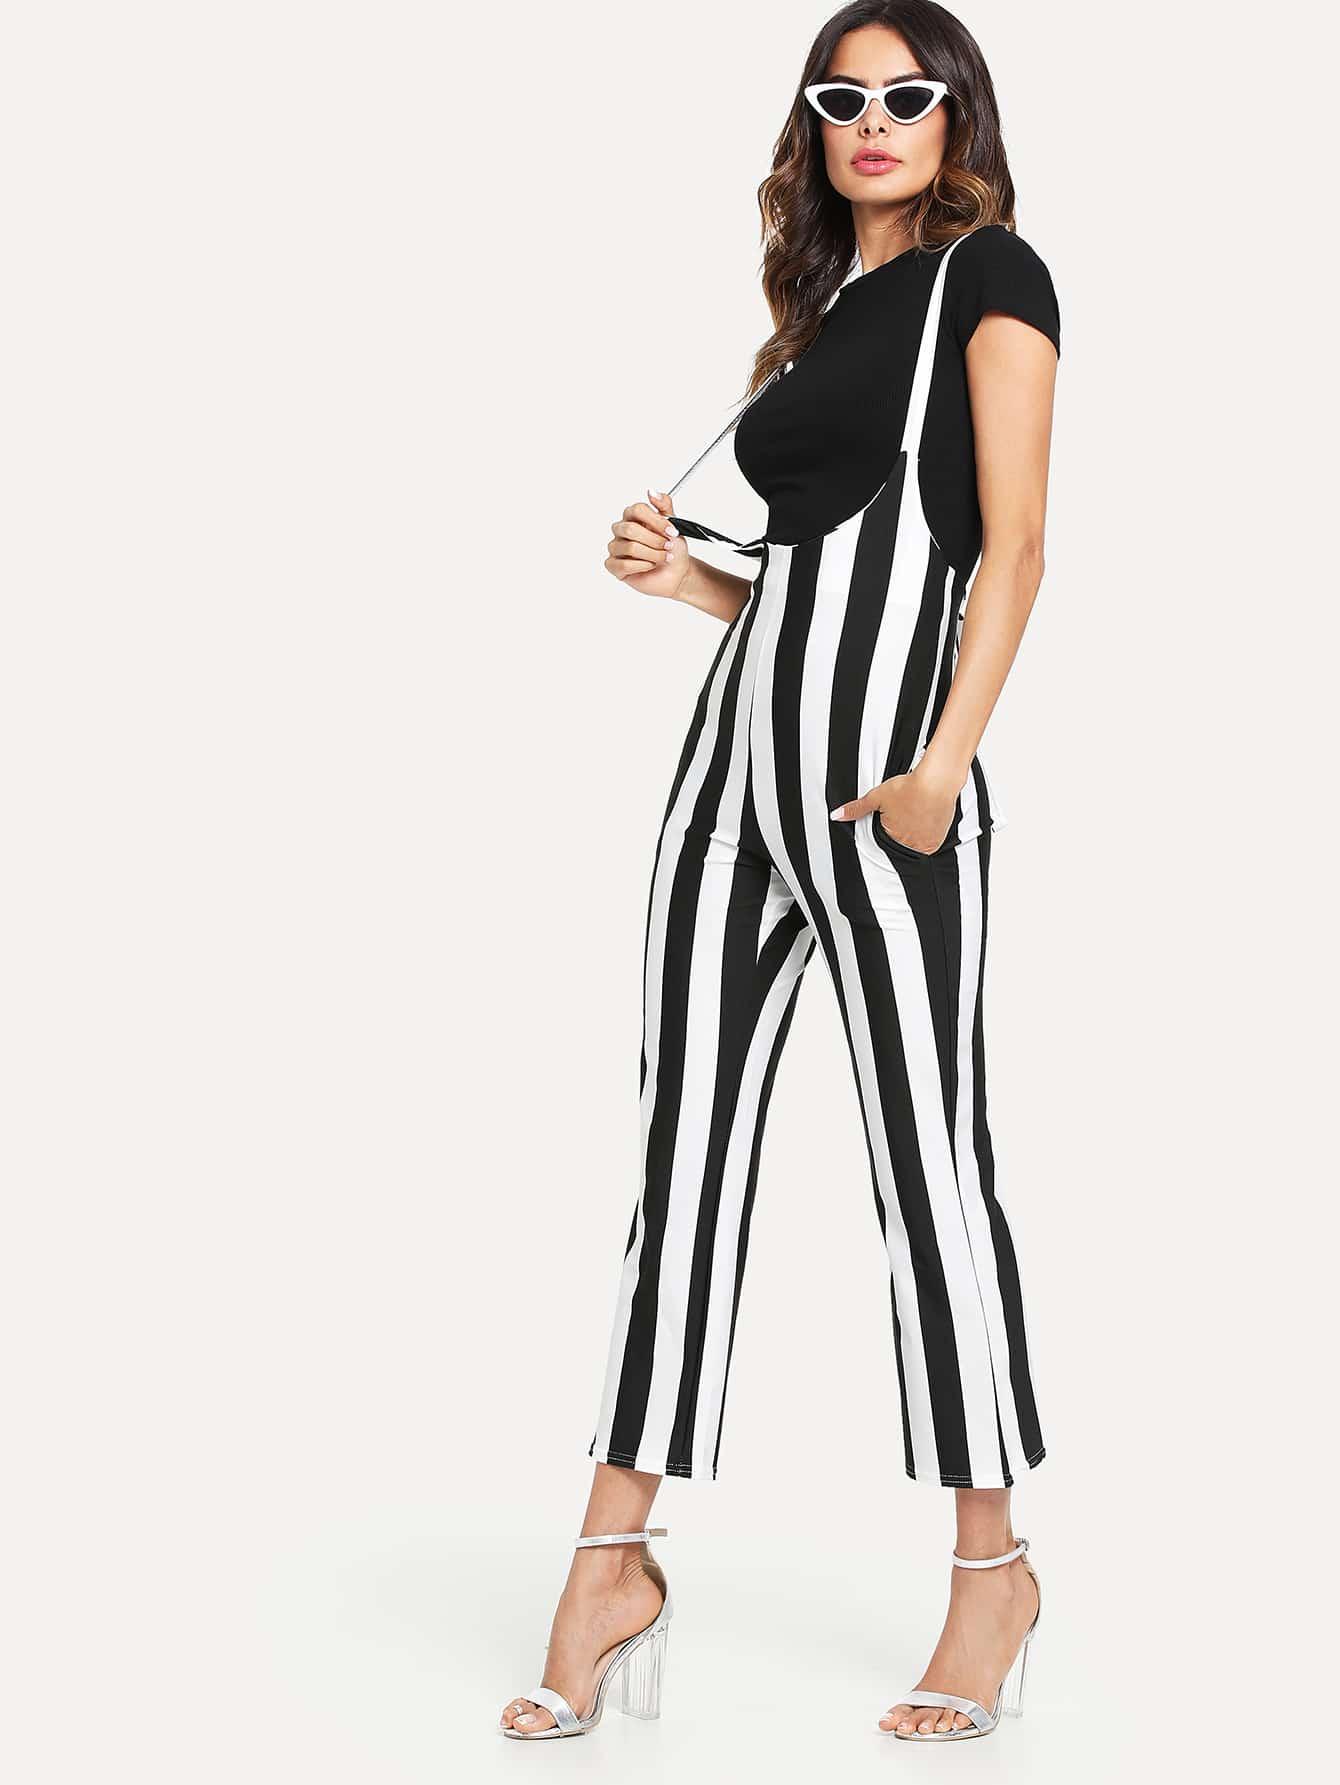 Criss Cross Back Striped Jumpsuit criss cross back scallop trim drawstring waist jumpsuit